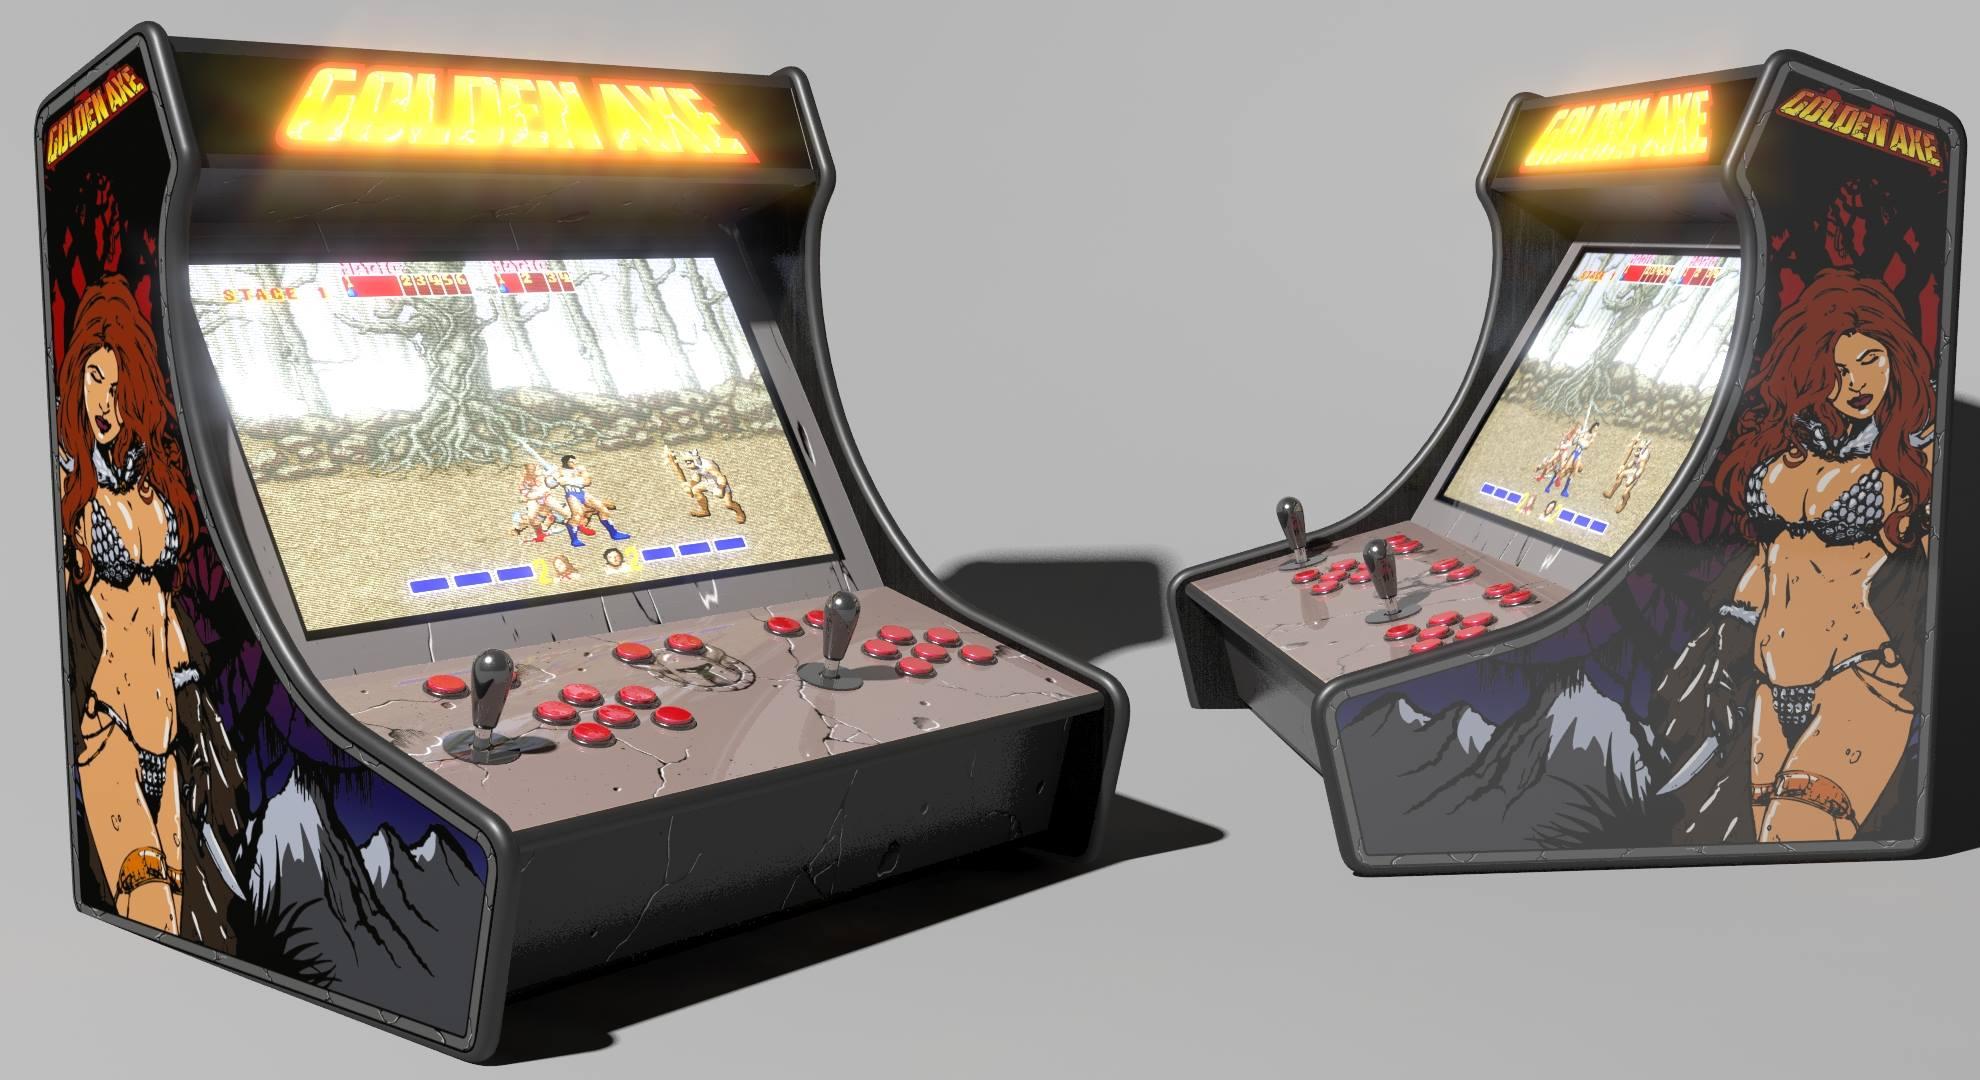 Bartop Arcade Artwok Template - RetroPie Forum